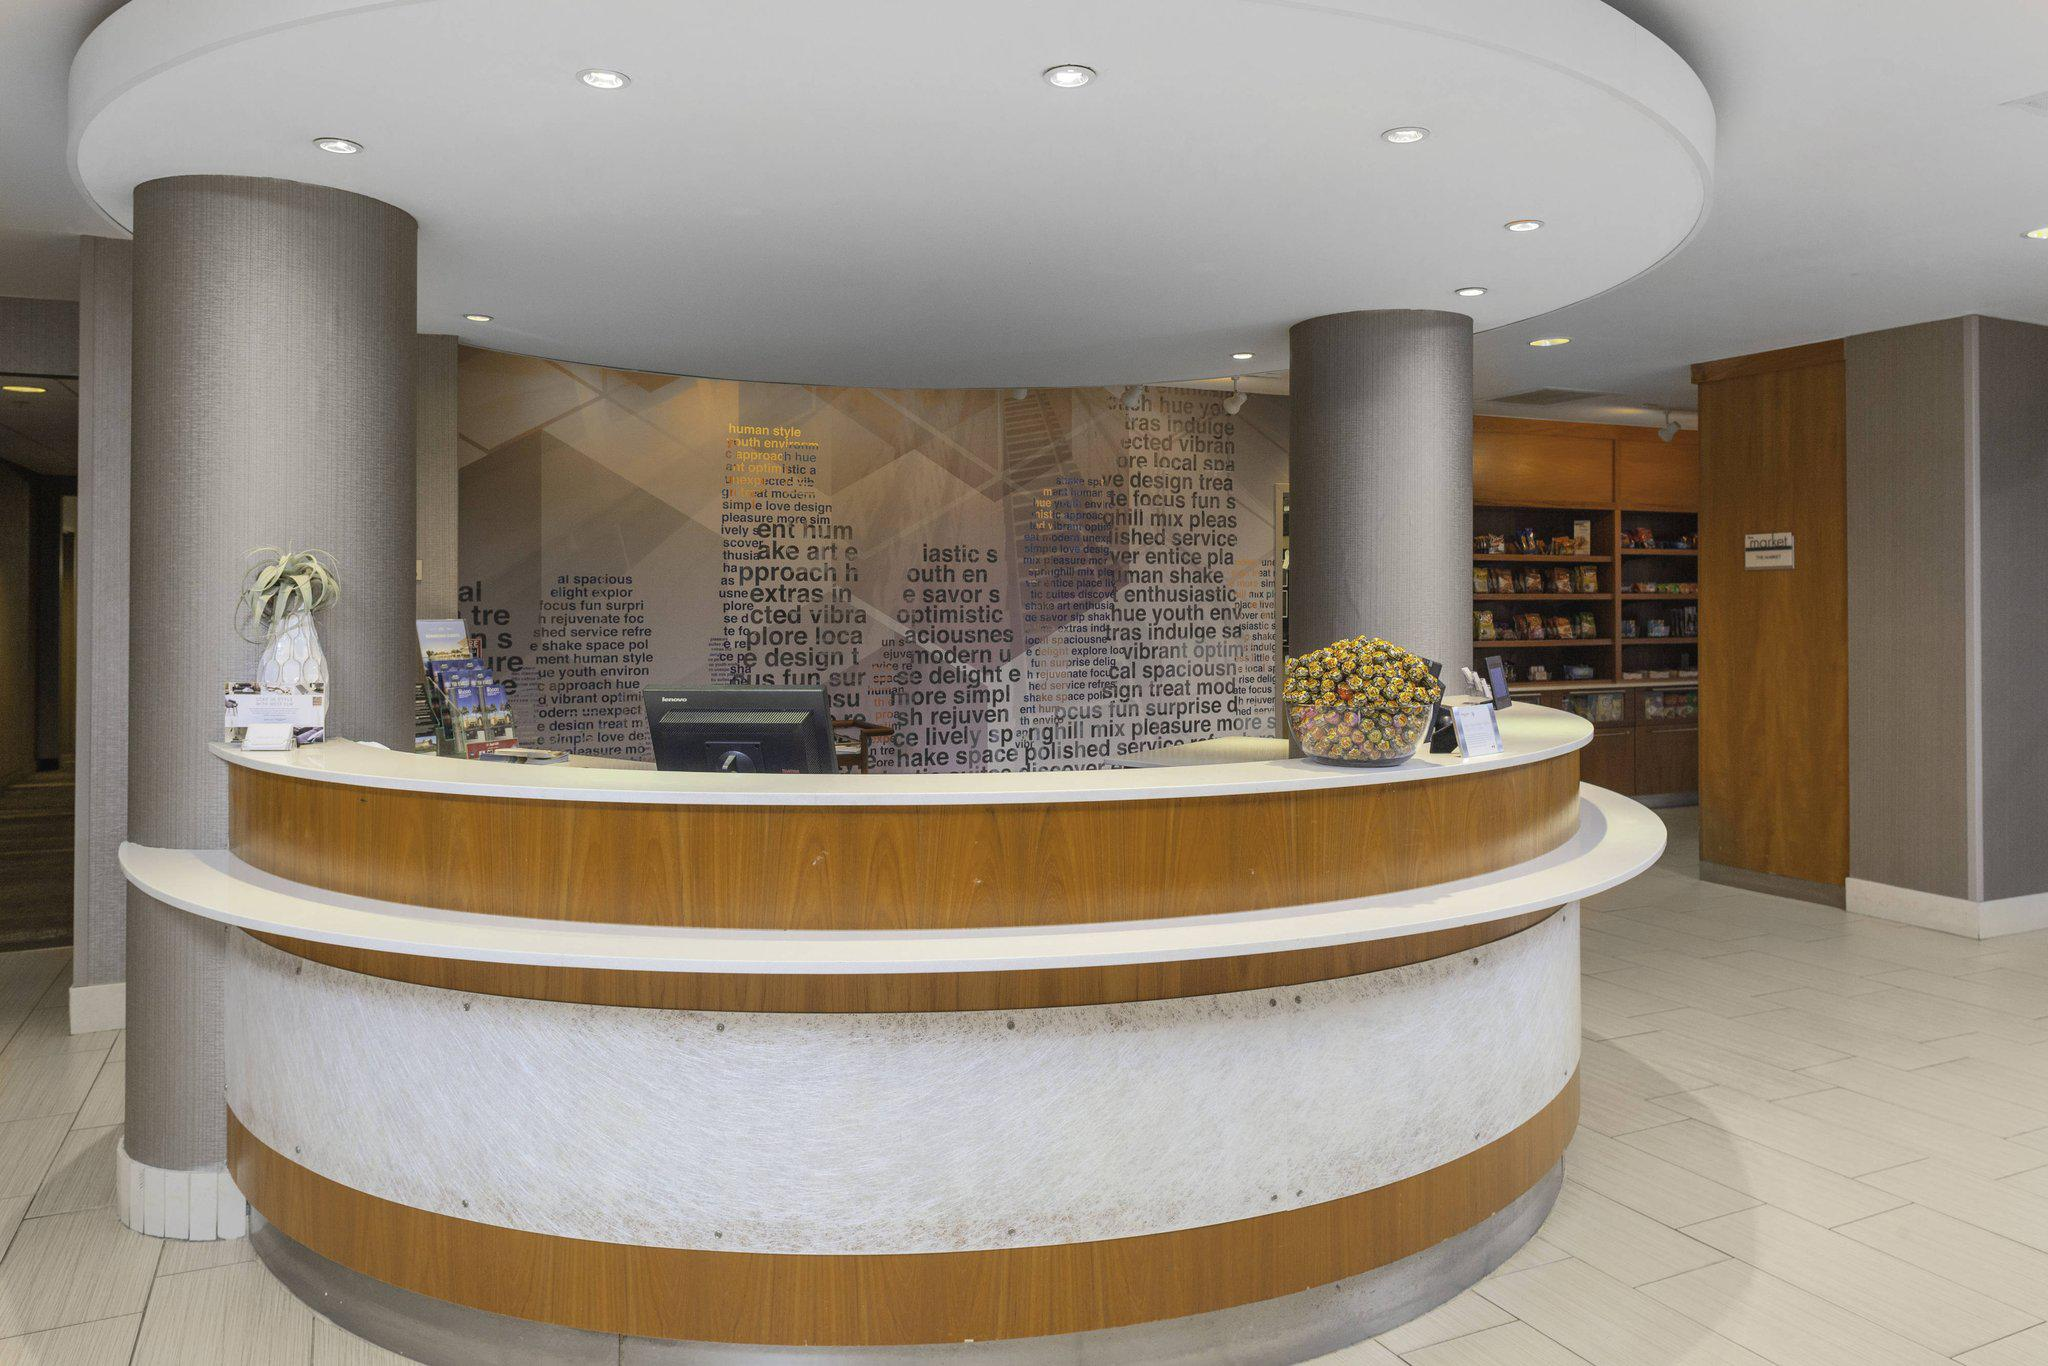 SpringHill Suites by Marriott Cincinnati North/Forest Park